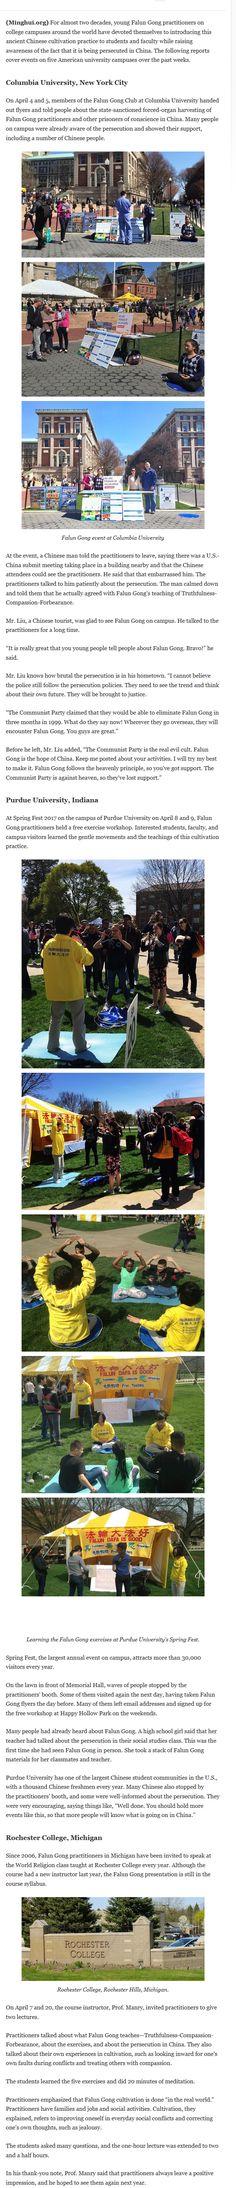 Falun Gong on College Campuses https://plus.google.com/+XMediaStudioValentin/posts/gzh8xVF7Yro